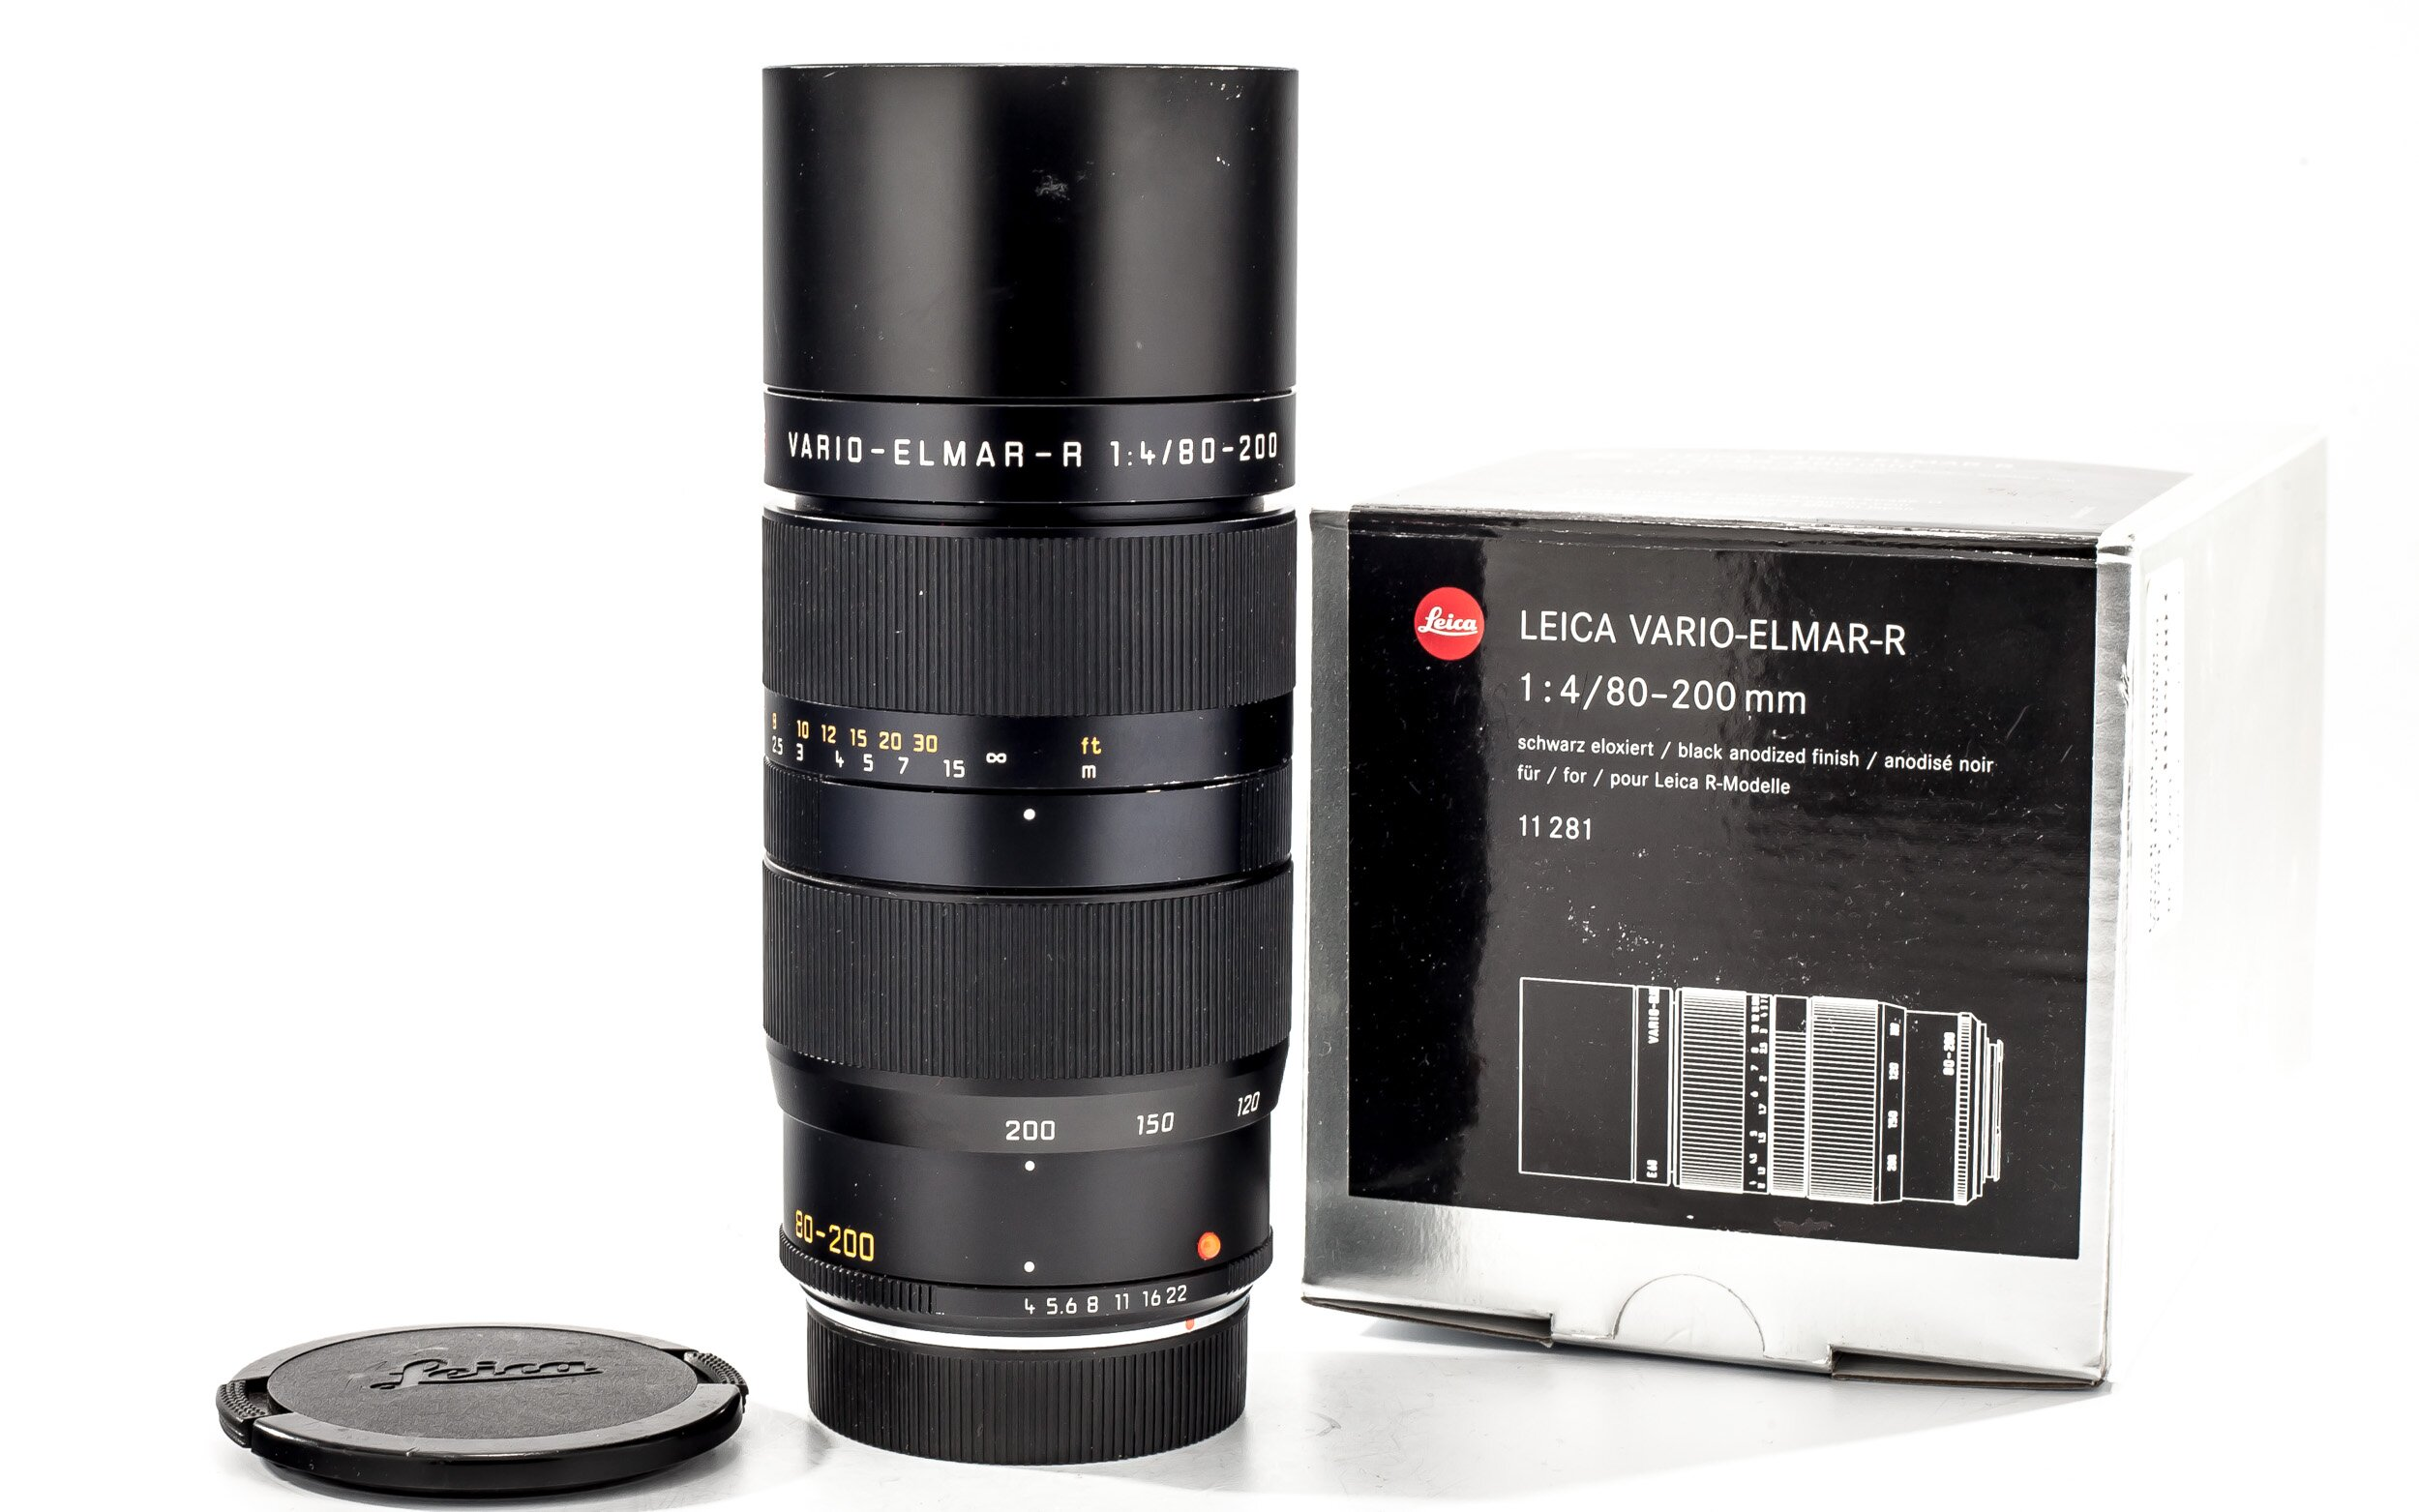 Leica 4/80-200mm Vario-Elmar-R E60 ROM 11281